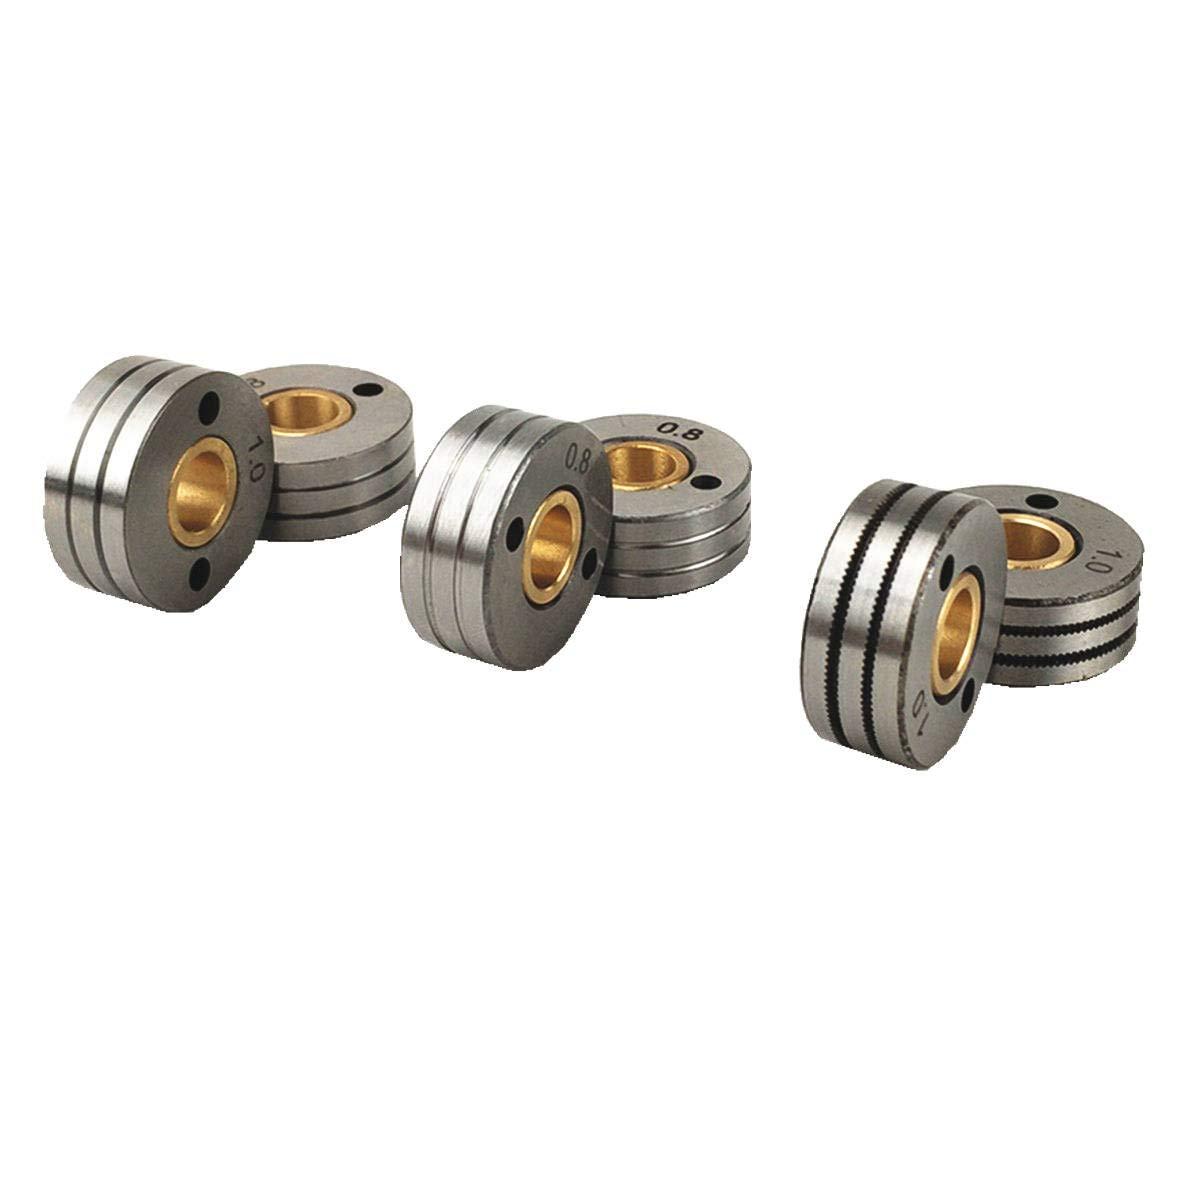 7496 MIG Welding Contact Tip 0.039 Inch Wire for Bernard S-Gun Series Torch Q-10